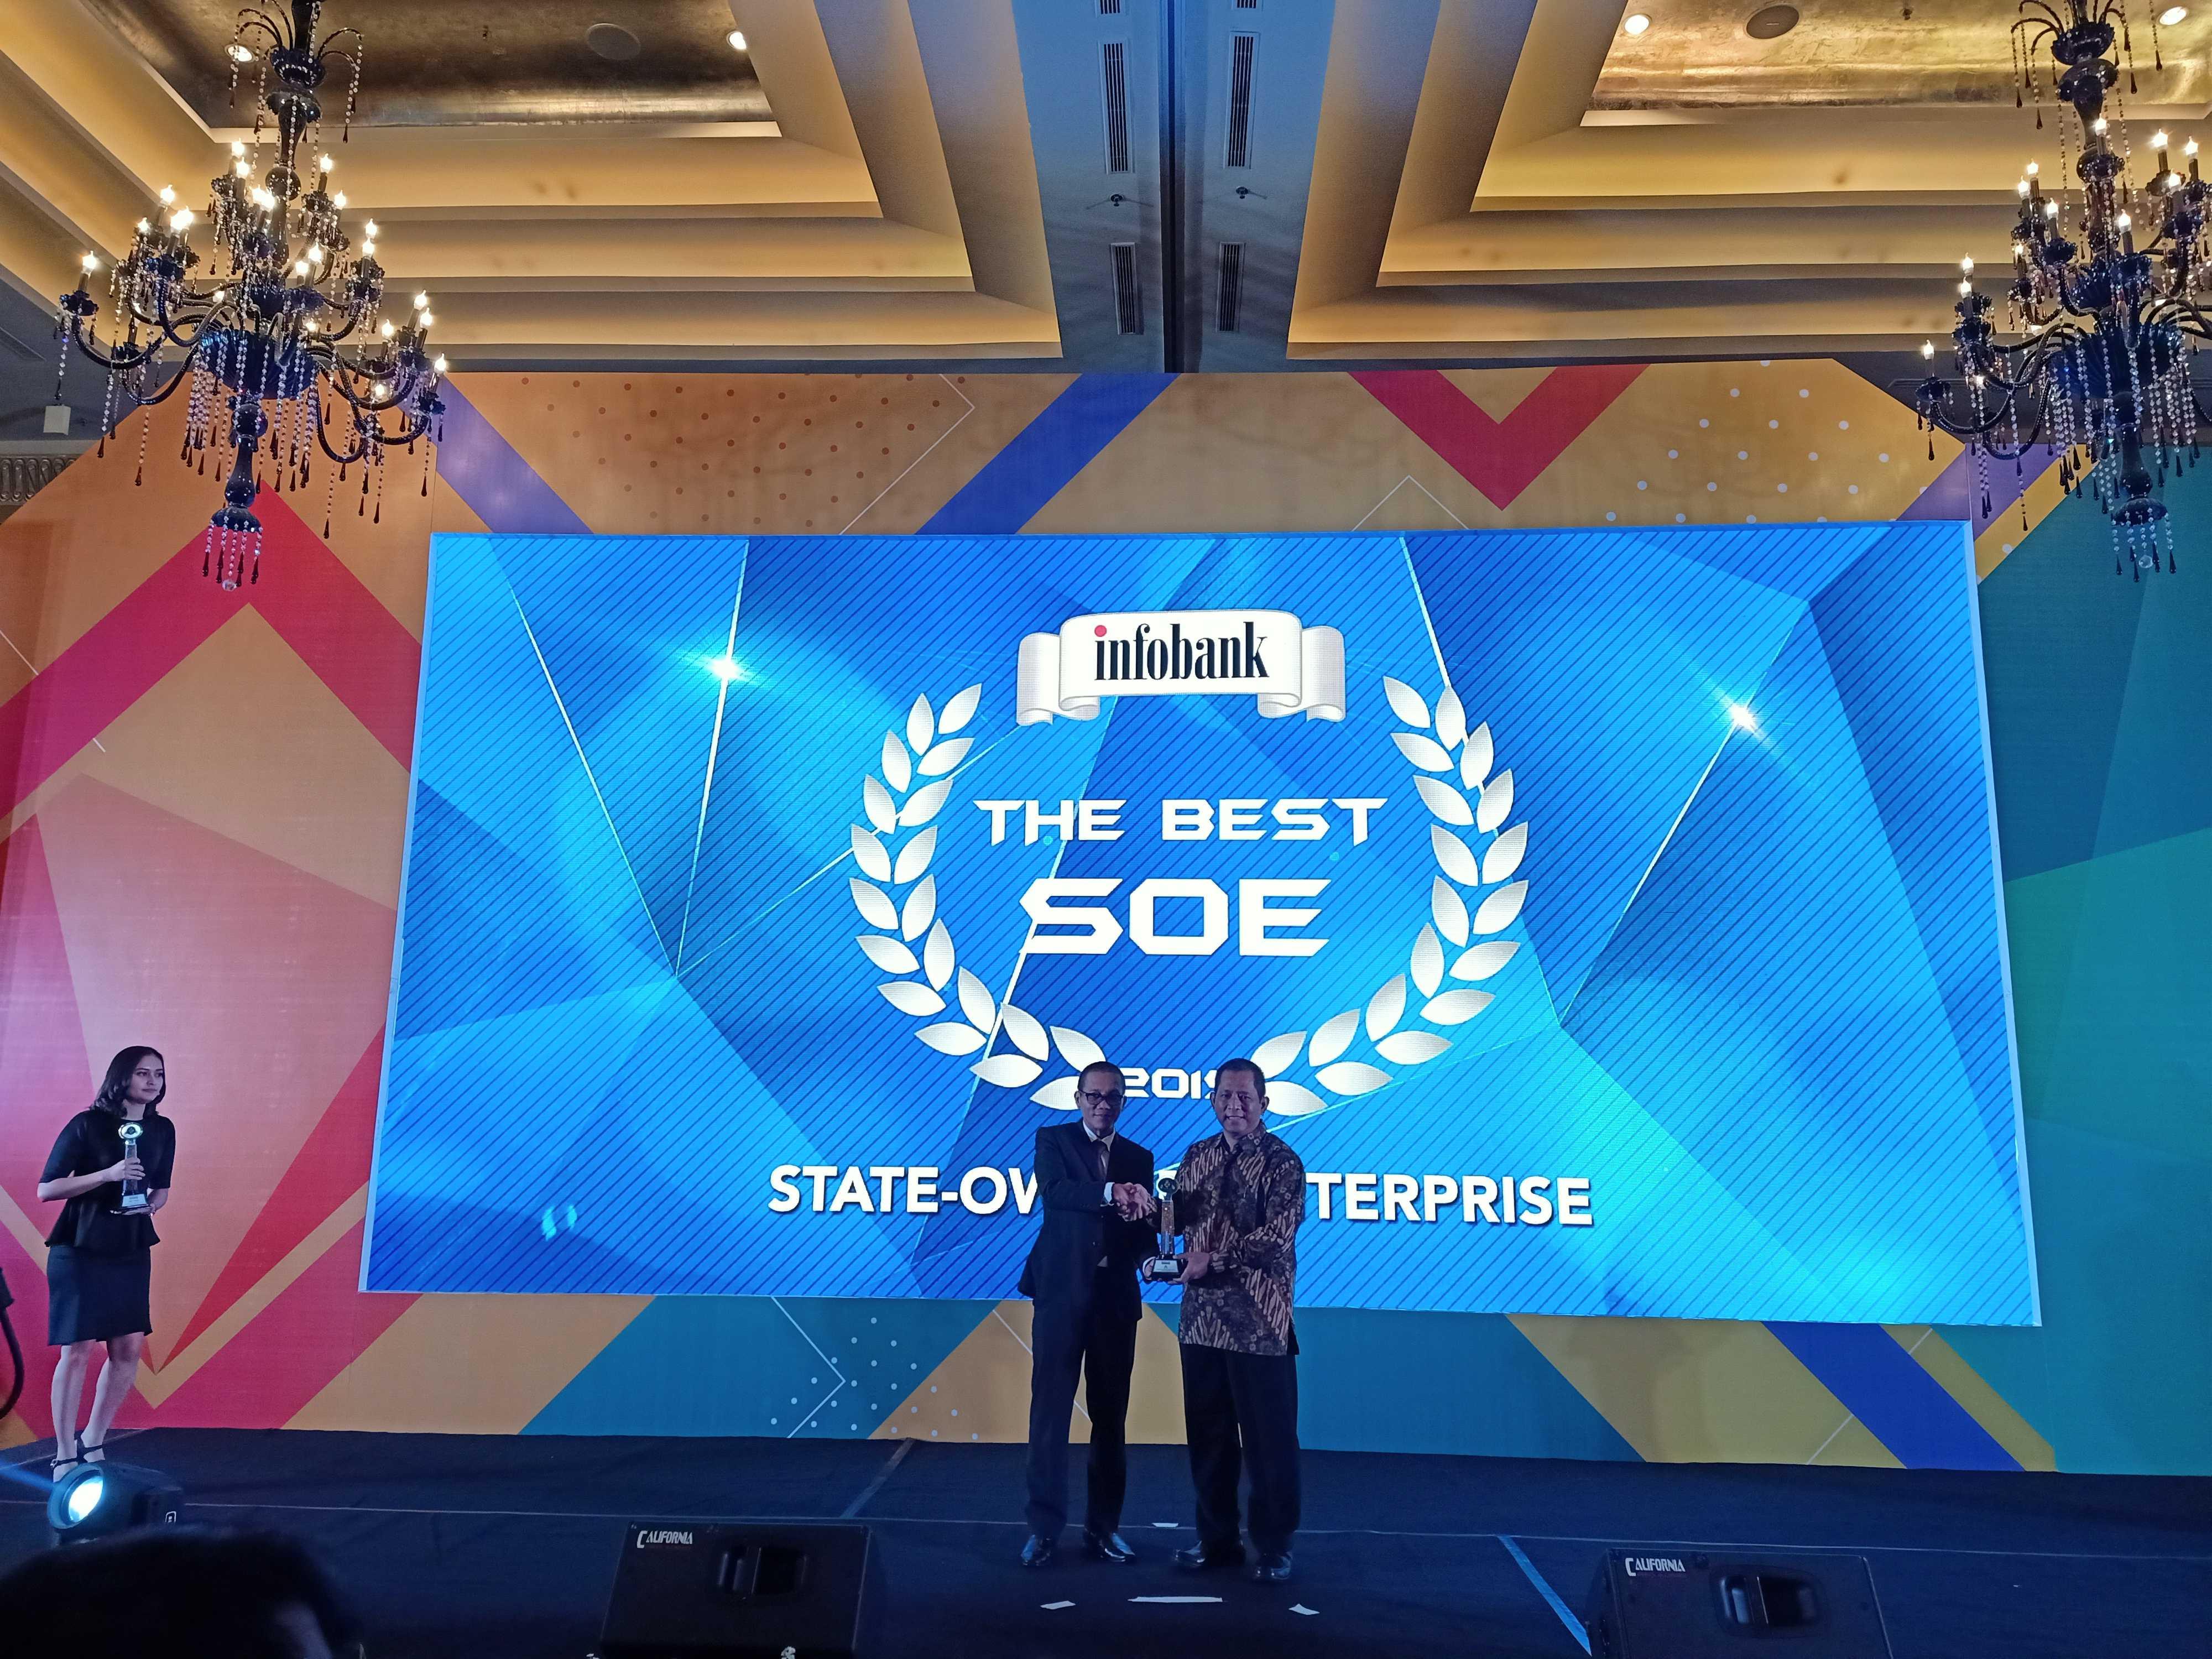 penghargaan infobank golden award